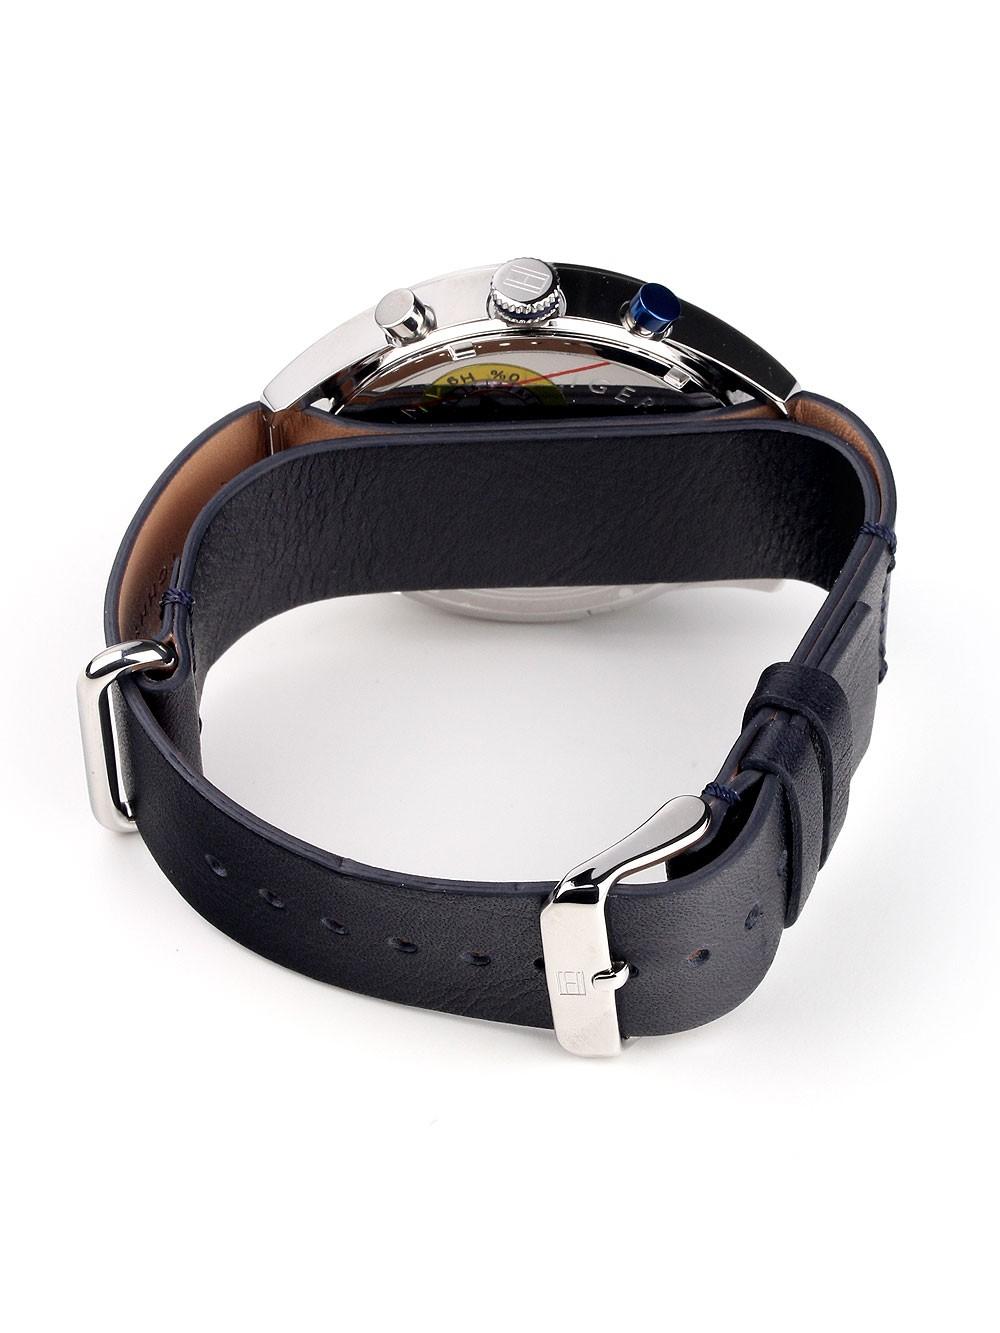 watches chrono12 tommy hilfiger 1791187 herrenuhr 44mm. Black Bedroom Furniture Sets. Home Design Ideas